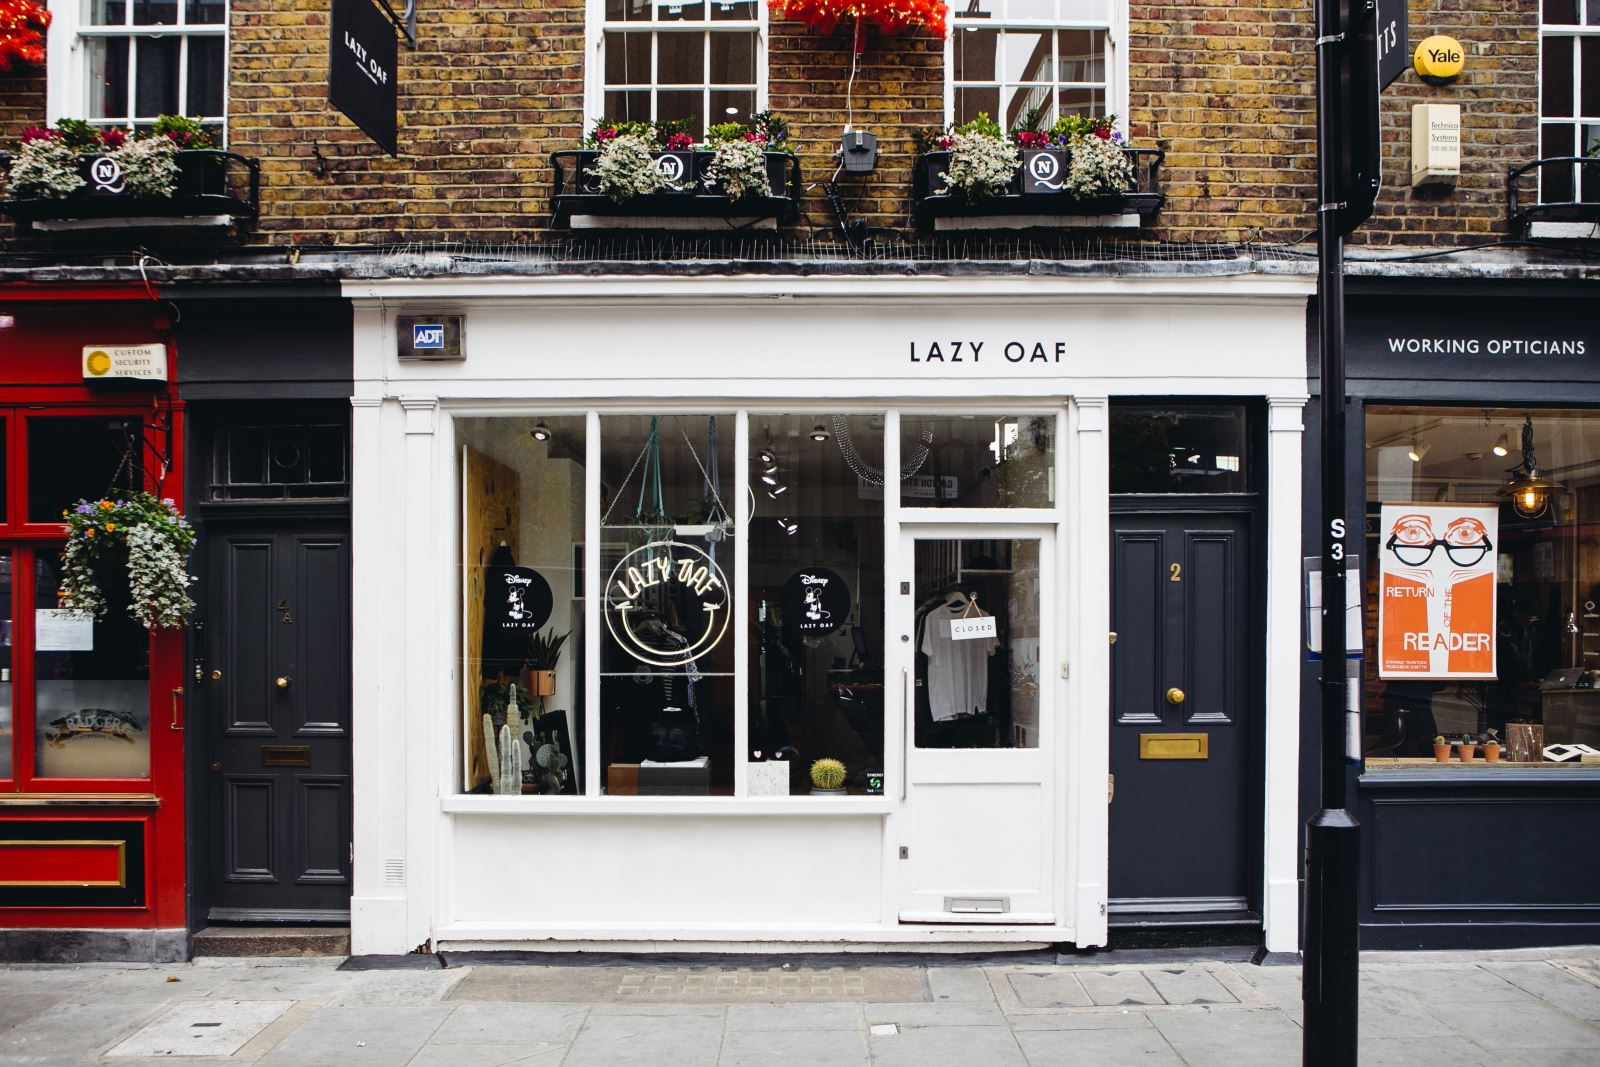 The Lazy Oaf, The Lazy Oaf london, london, london boutiques, shopping in london